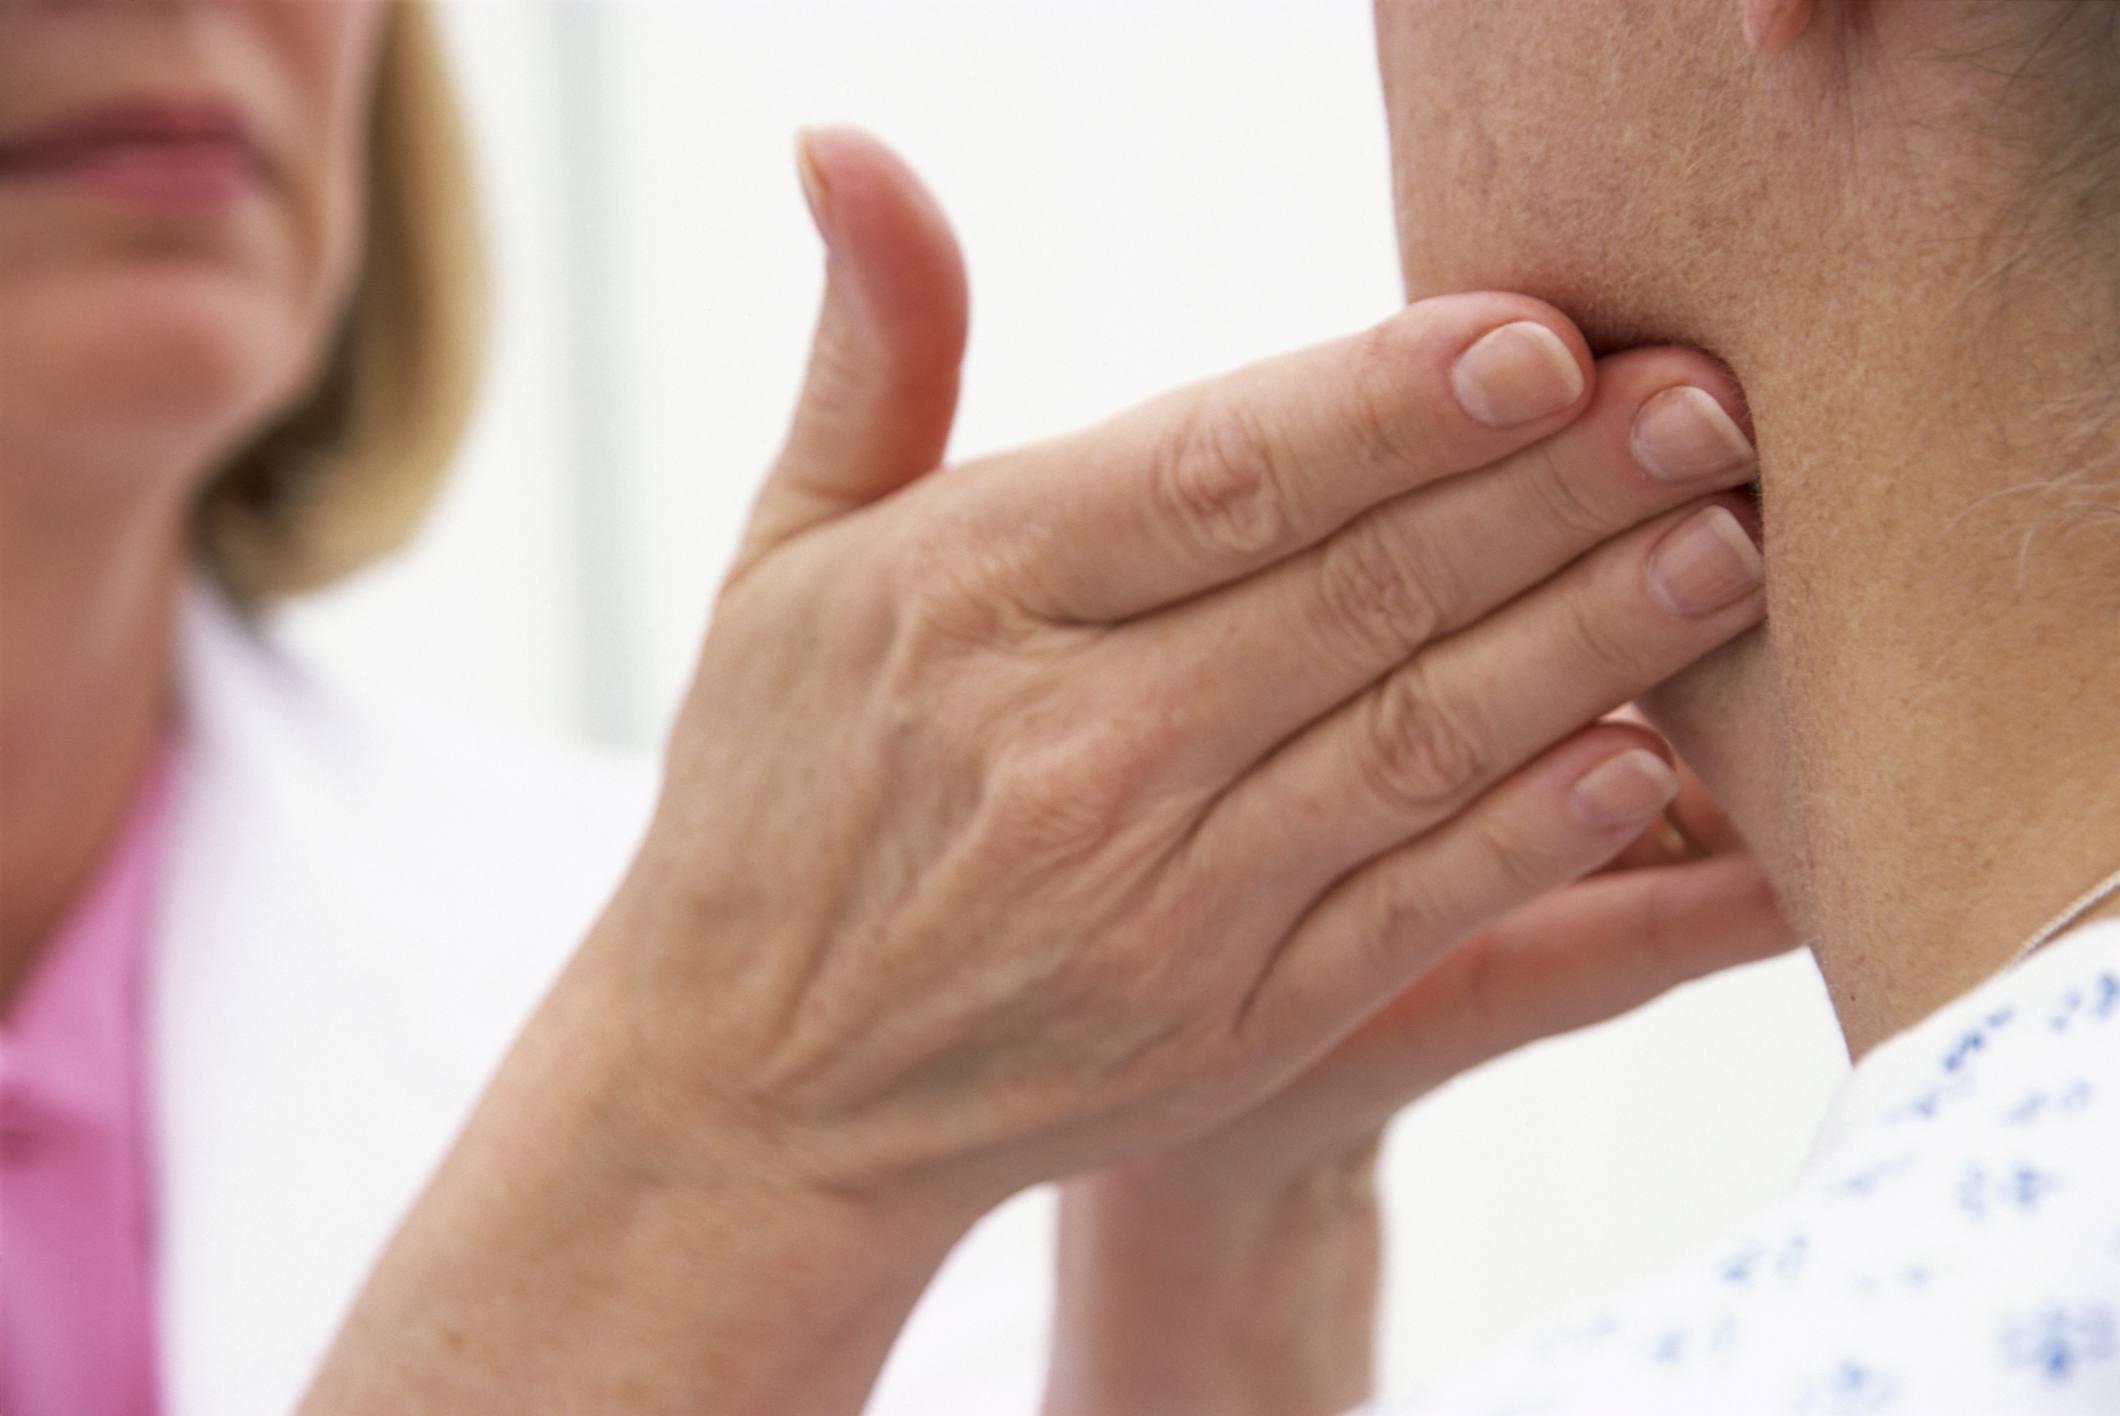 HIV and Lymphadenopathy (Swollen Lymph Nodes)